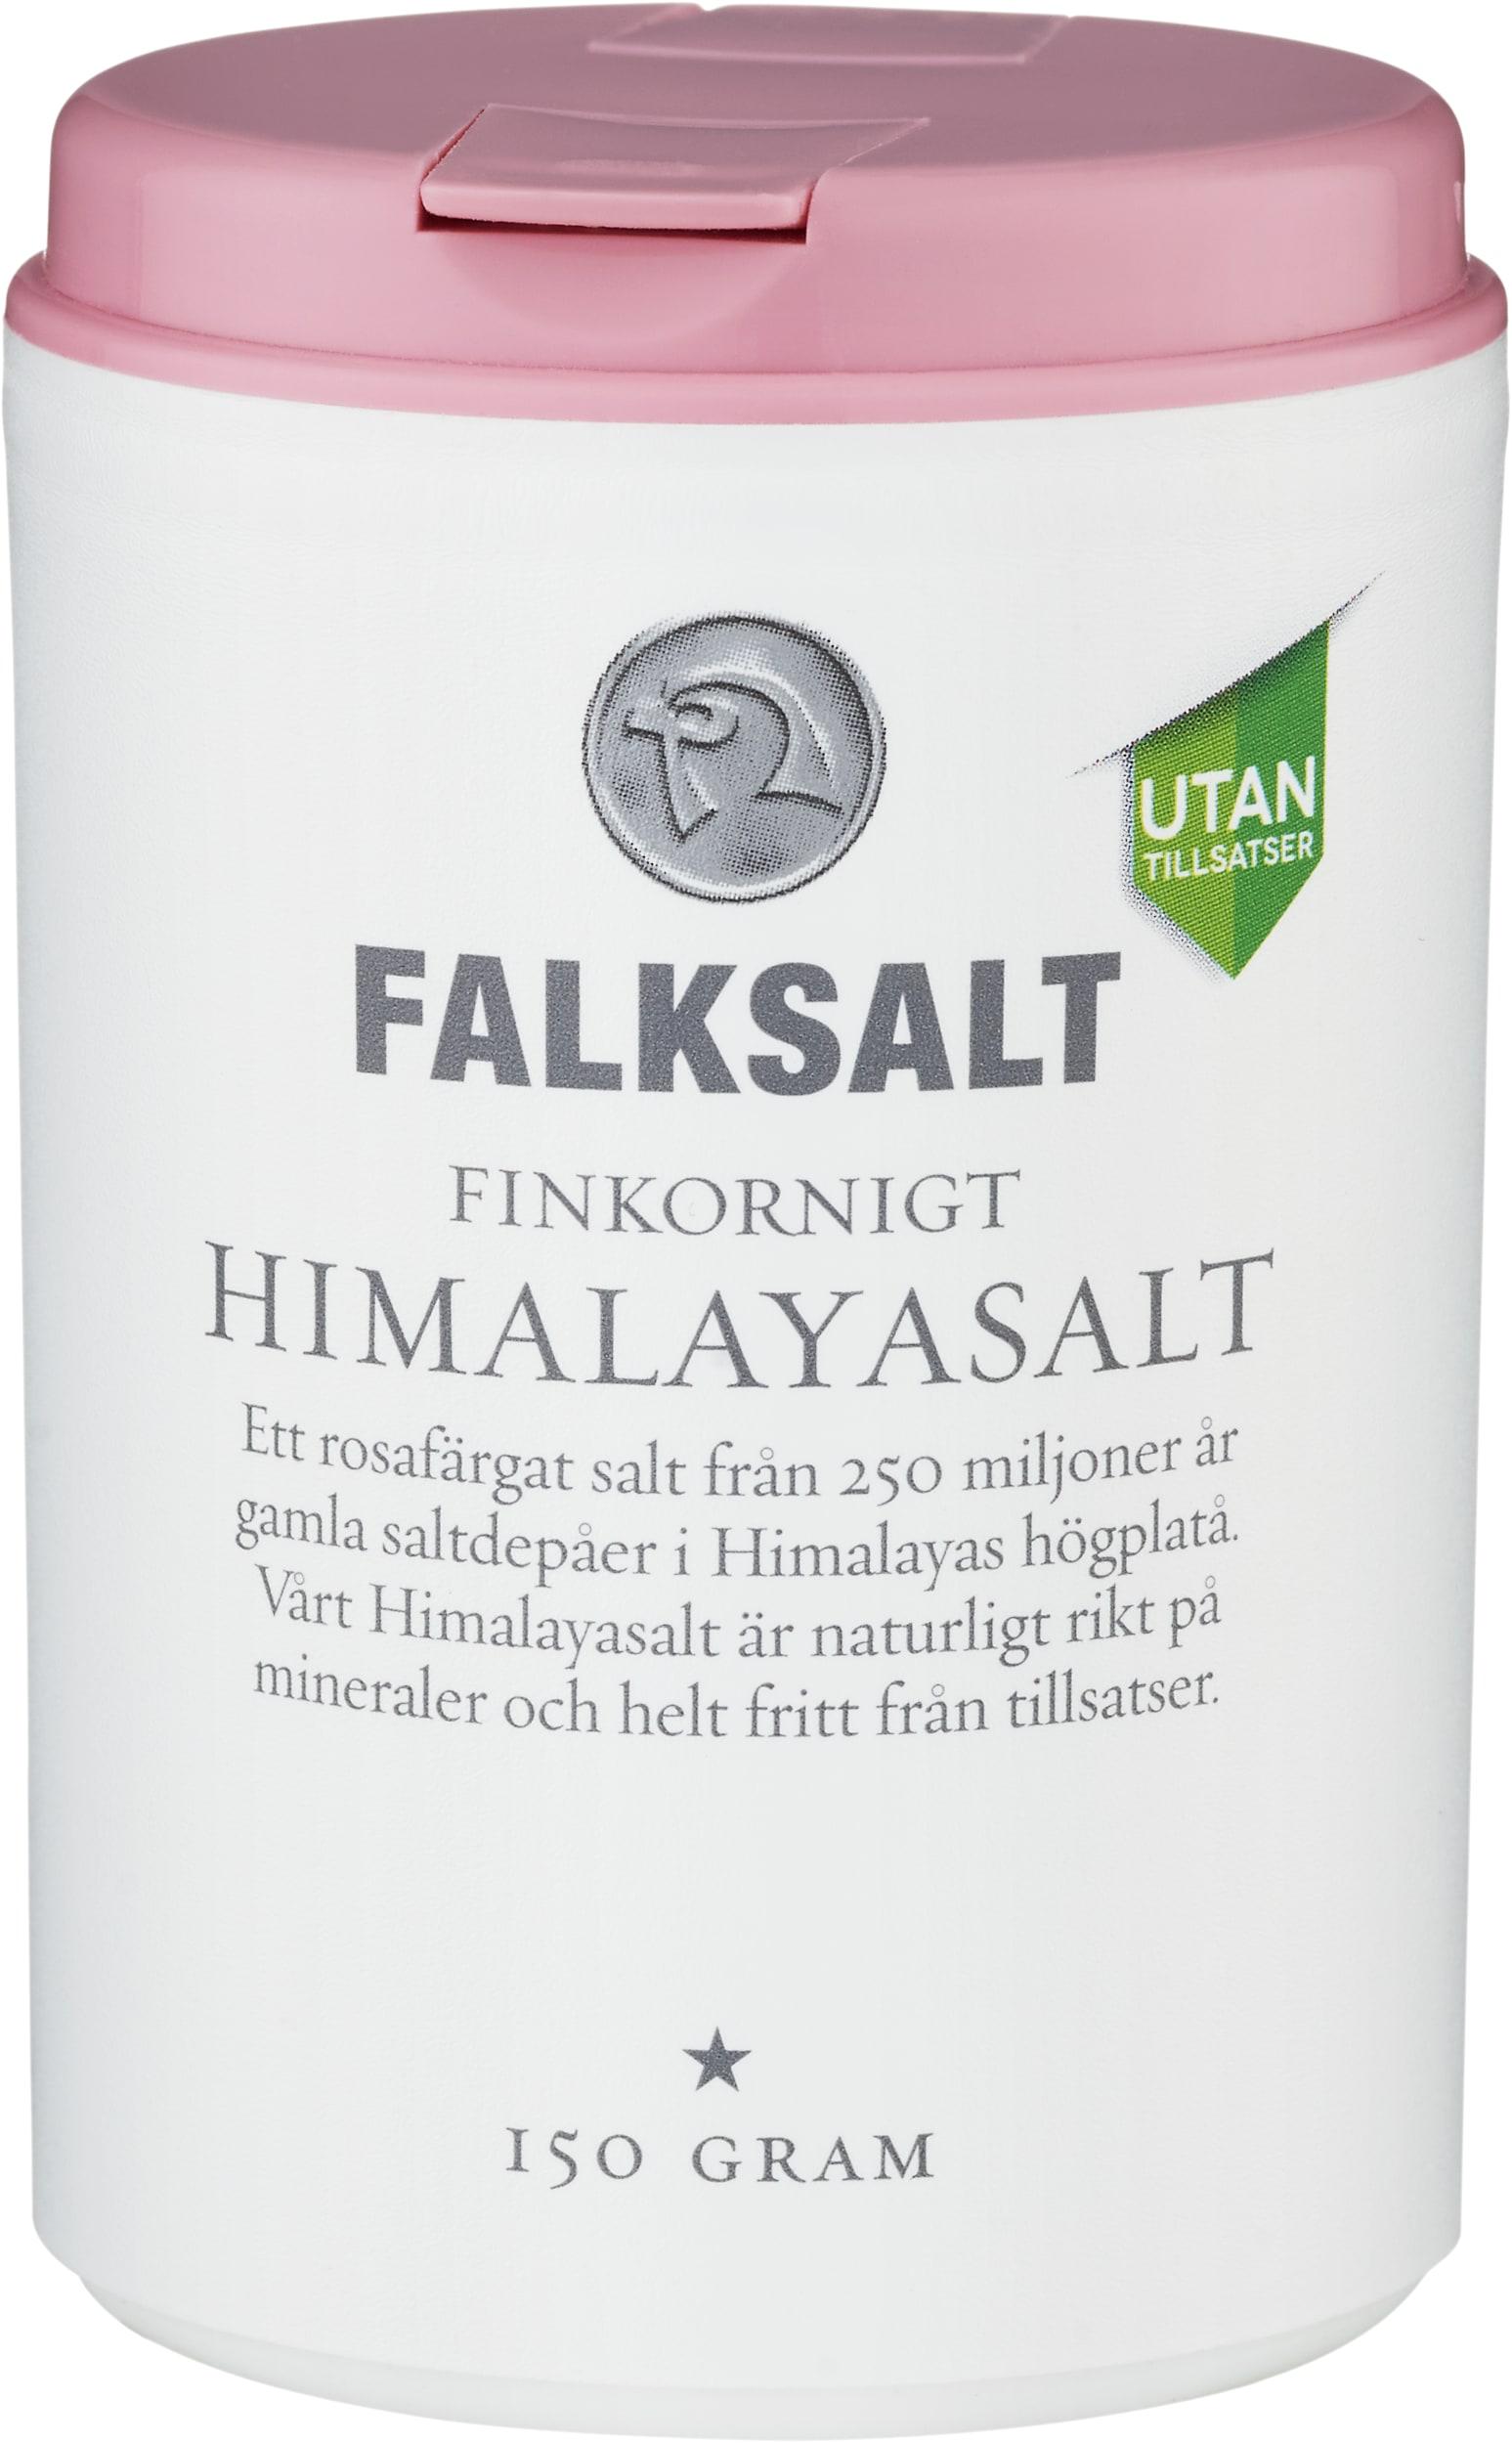 salt utan tillsatser